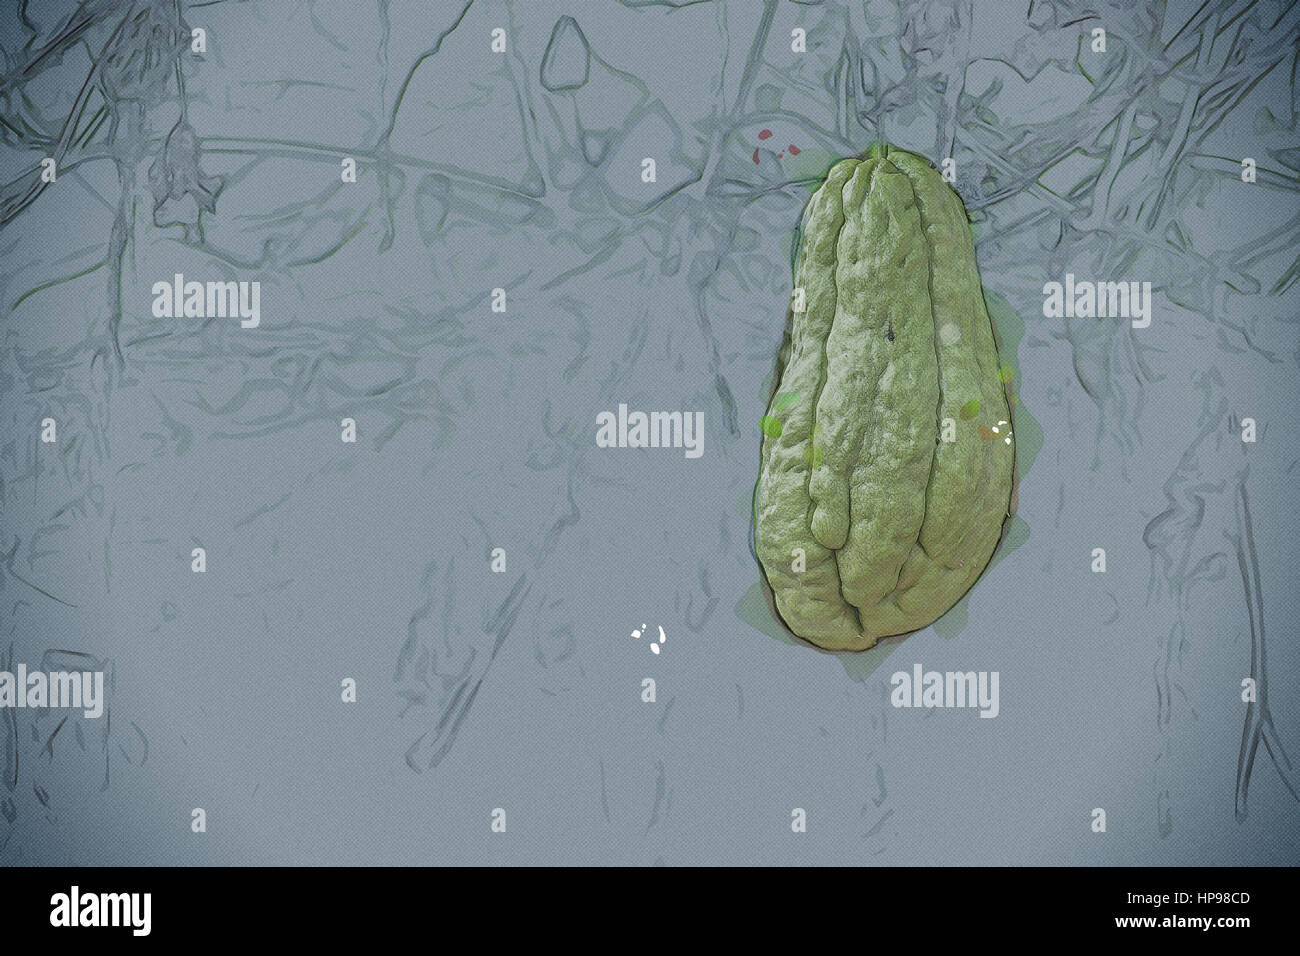 Gemüse-Plantage in Vietnam. Momordica Charantia oft bitter Melone ...